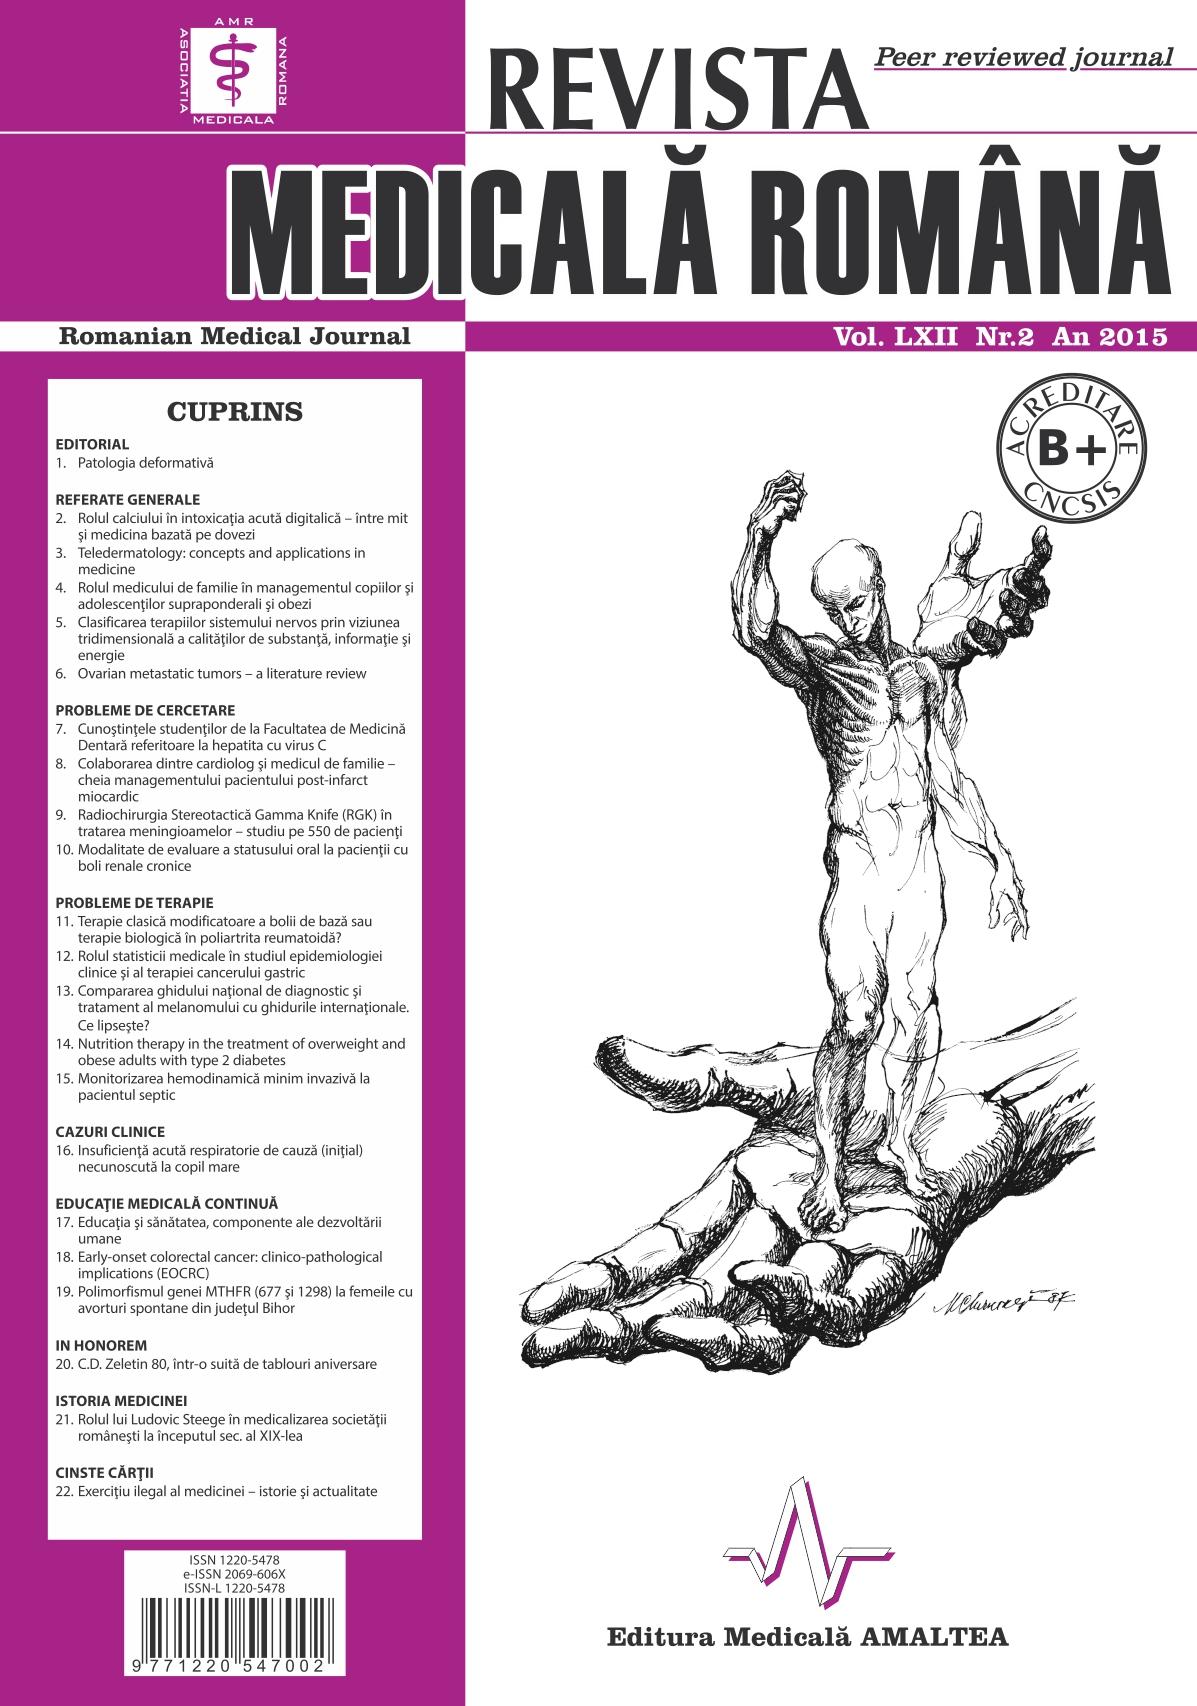 REVISTA MEDICALA ROMANA - Romanian Medical Journal, Vol. LXII, No. 2, Year 2015